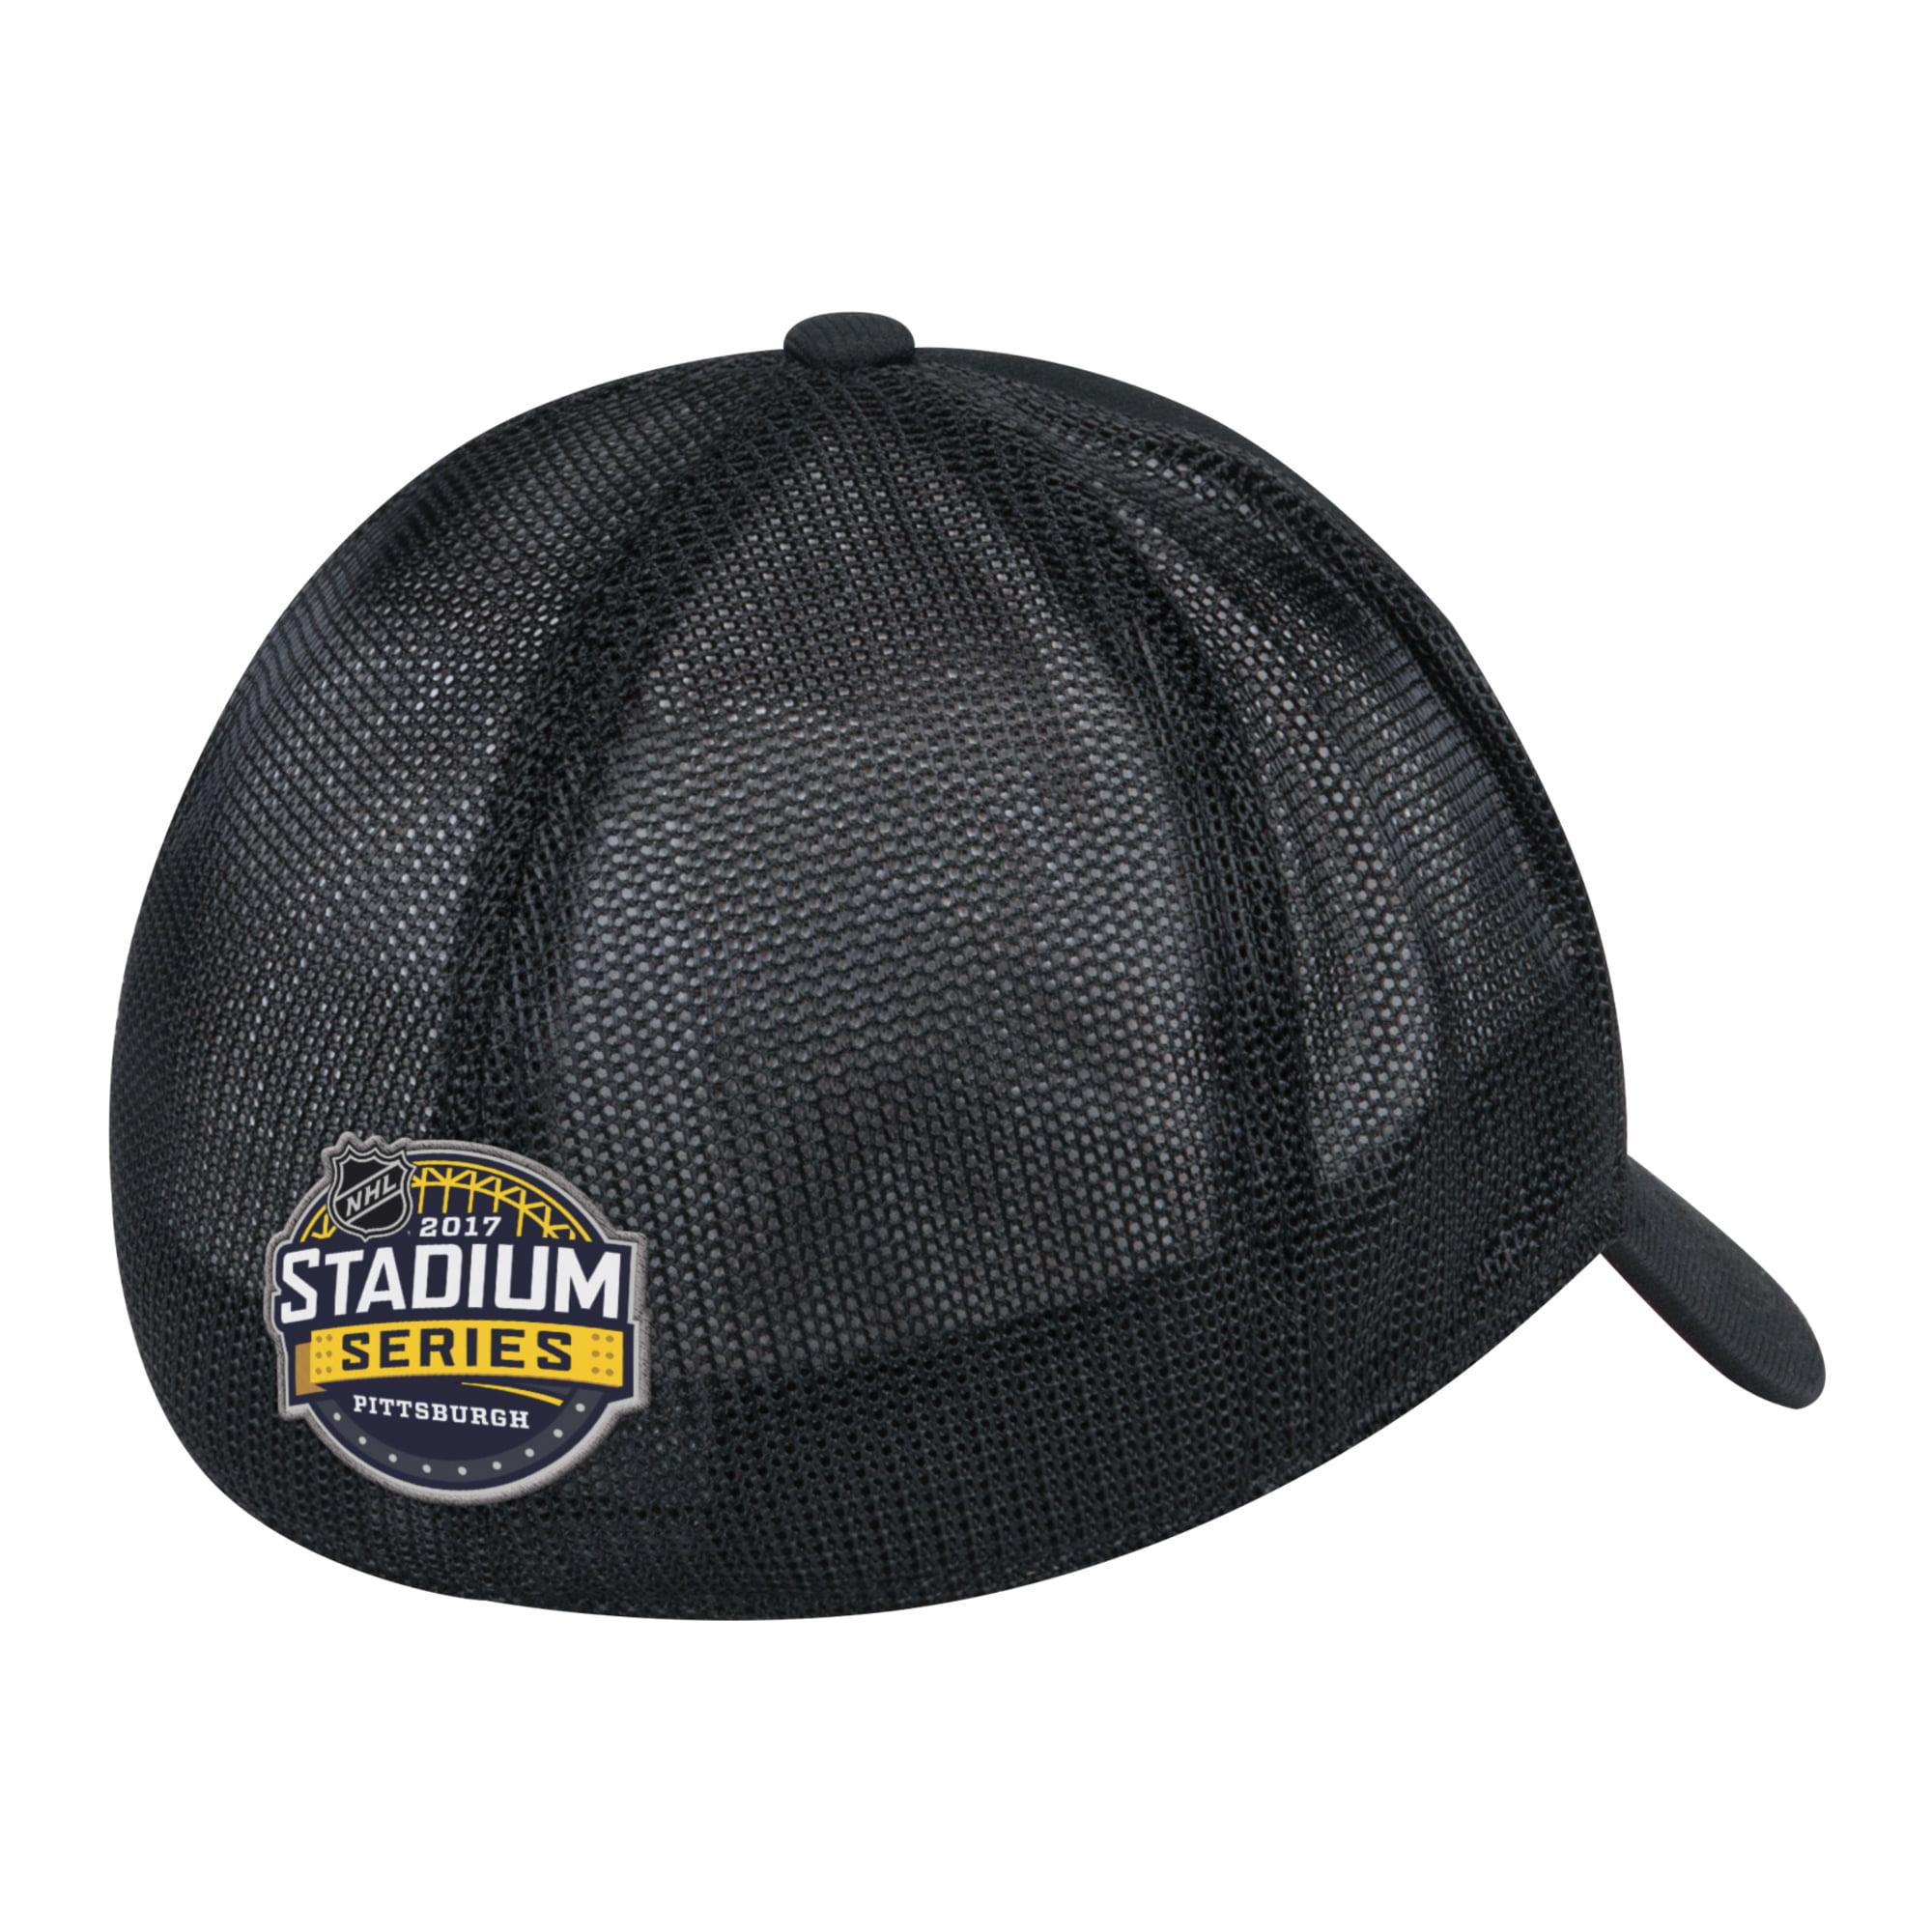 f36a02e9eb9 Philadelphia Flyers Reebok 2017 Stadium Series Coach Structured Flex Hat -  Black - Walmart.com